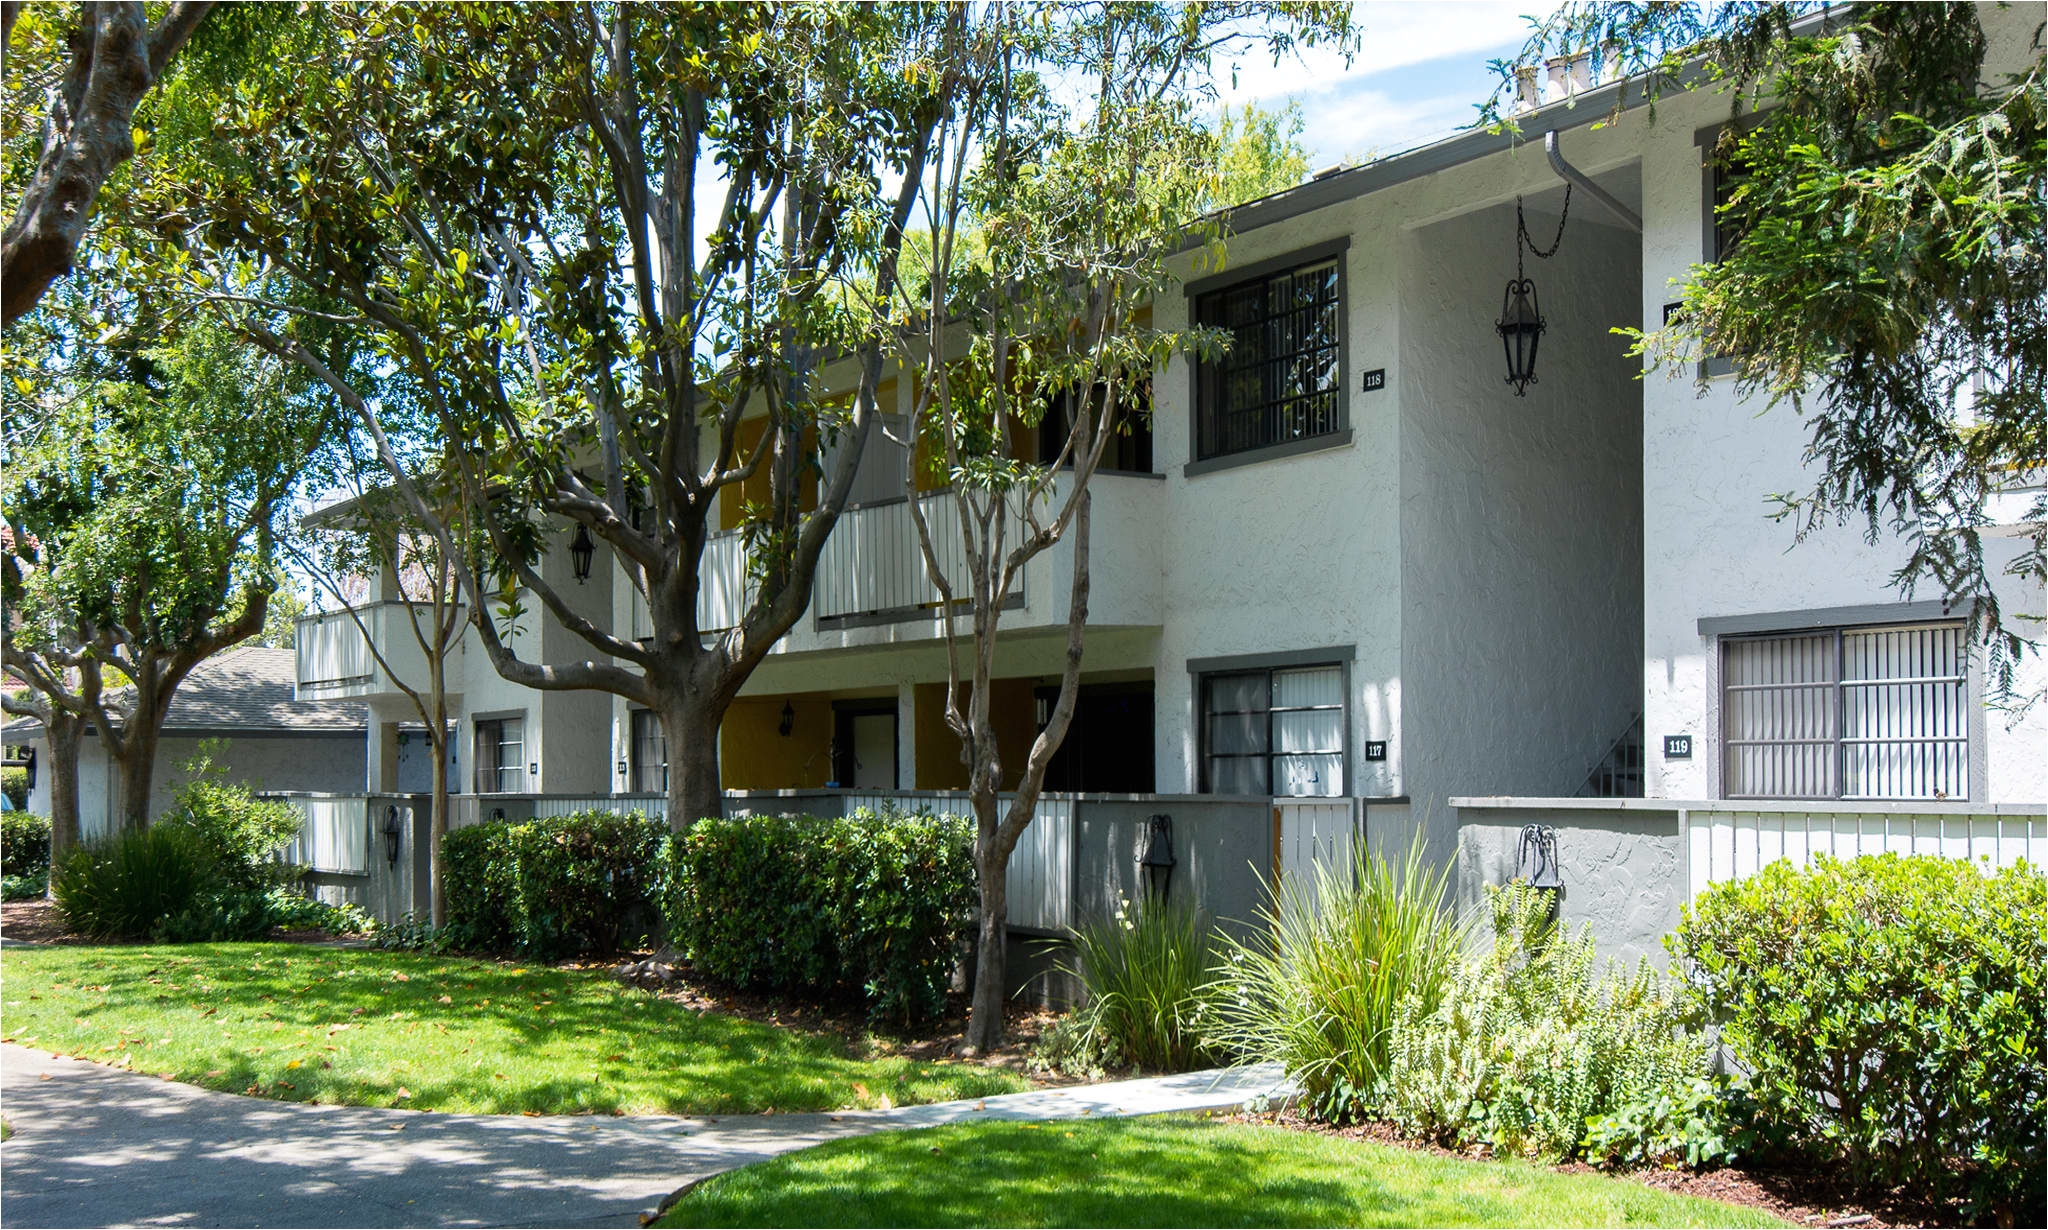 verandas at cupertino apartments apartments in cupertino ca to rent photo 1